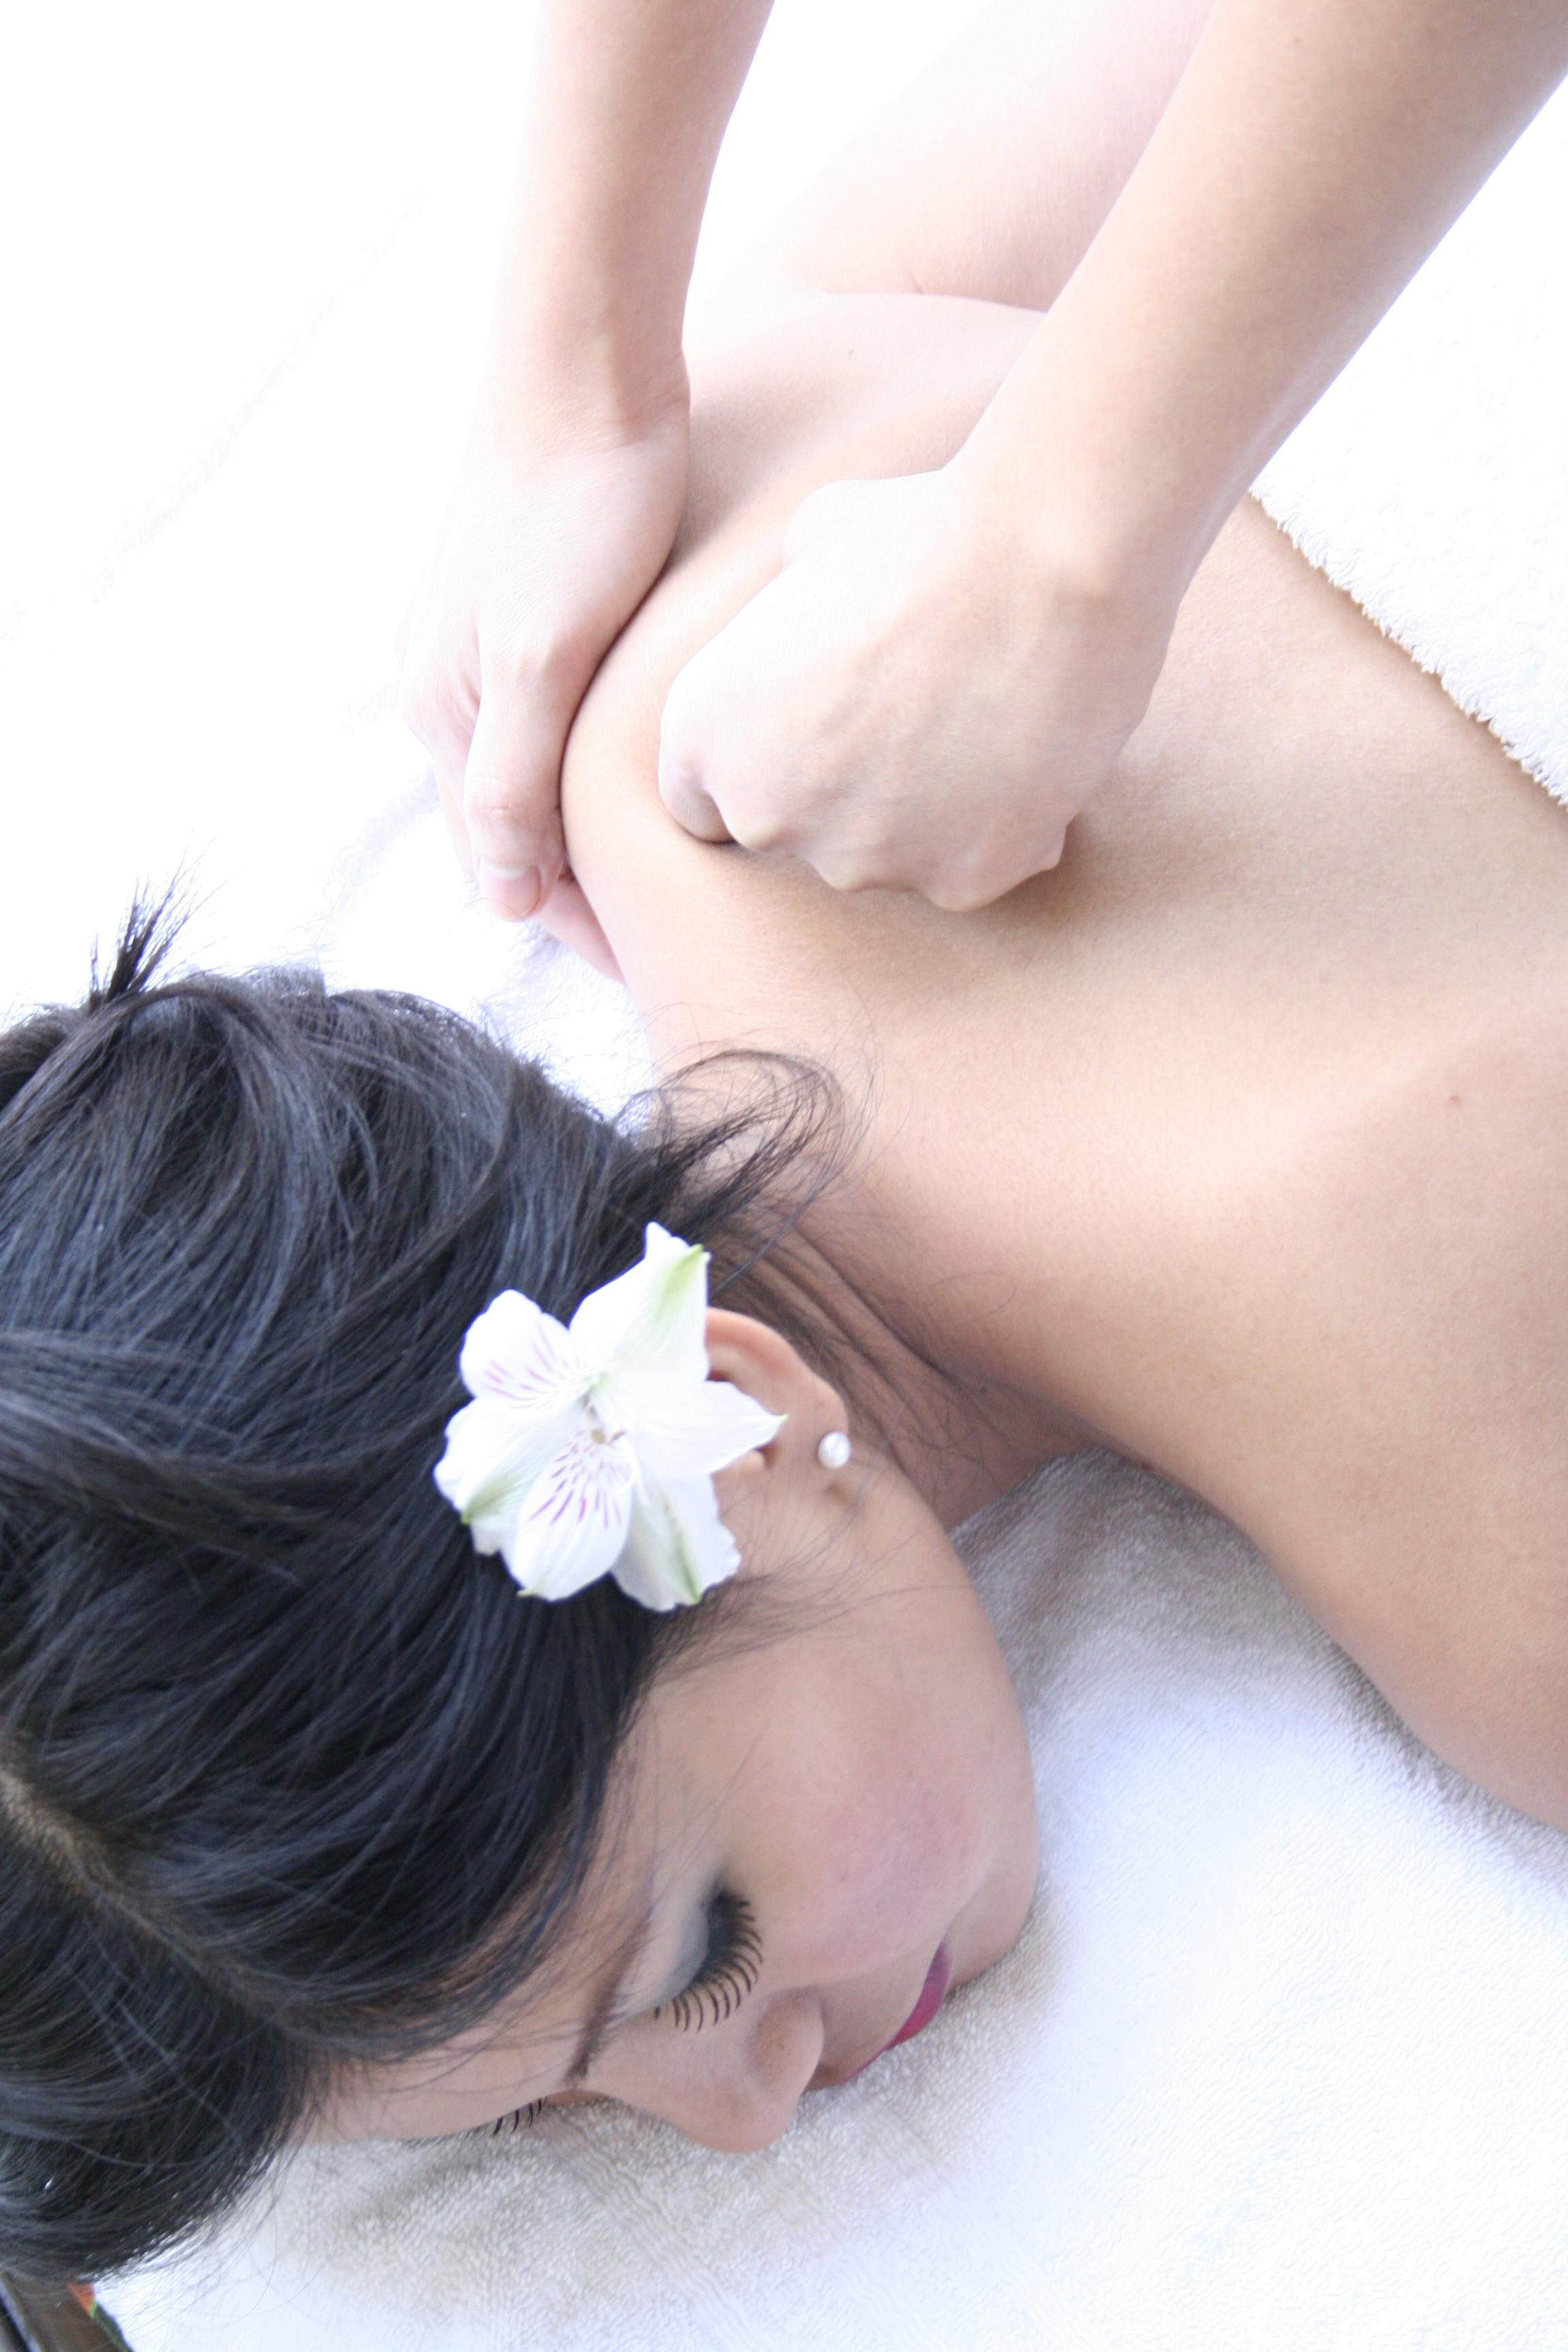 Thai Medical Massage - 1 Hour